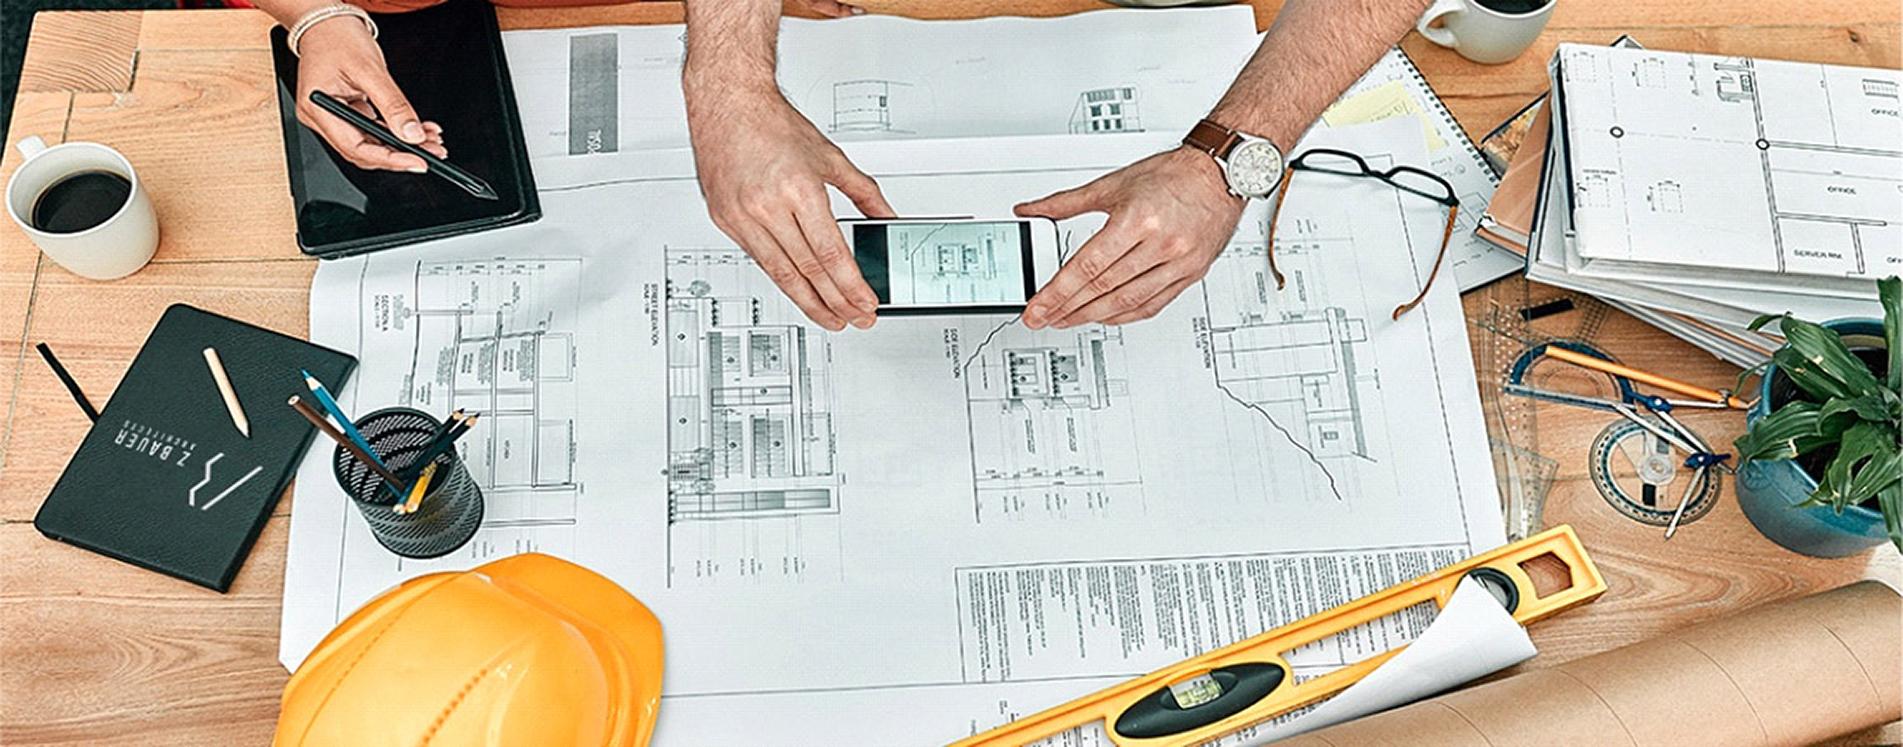 design-services-7